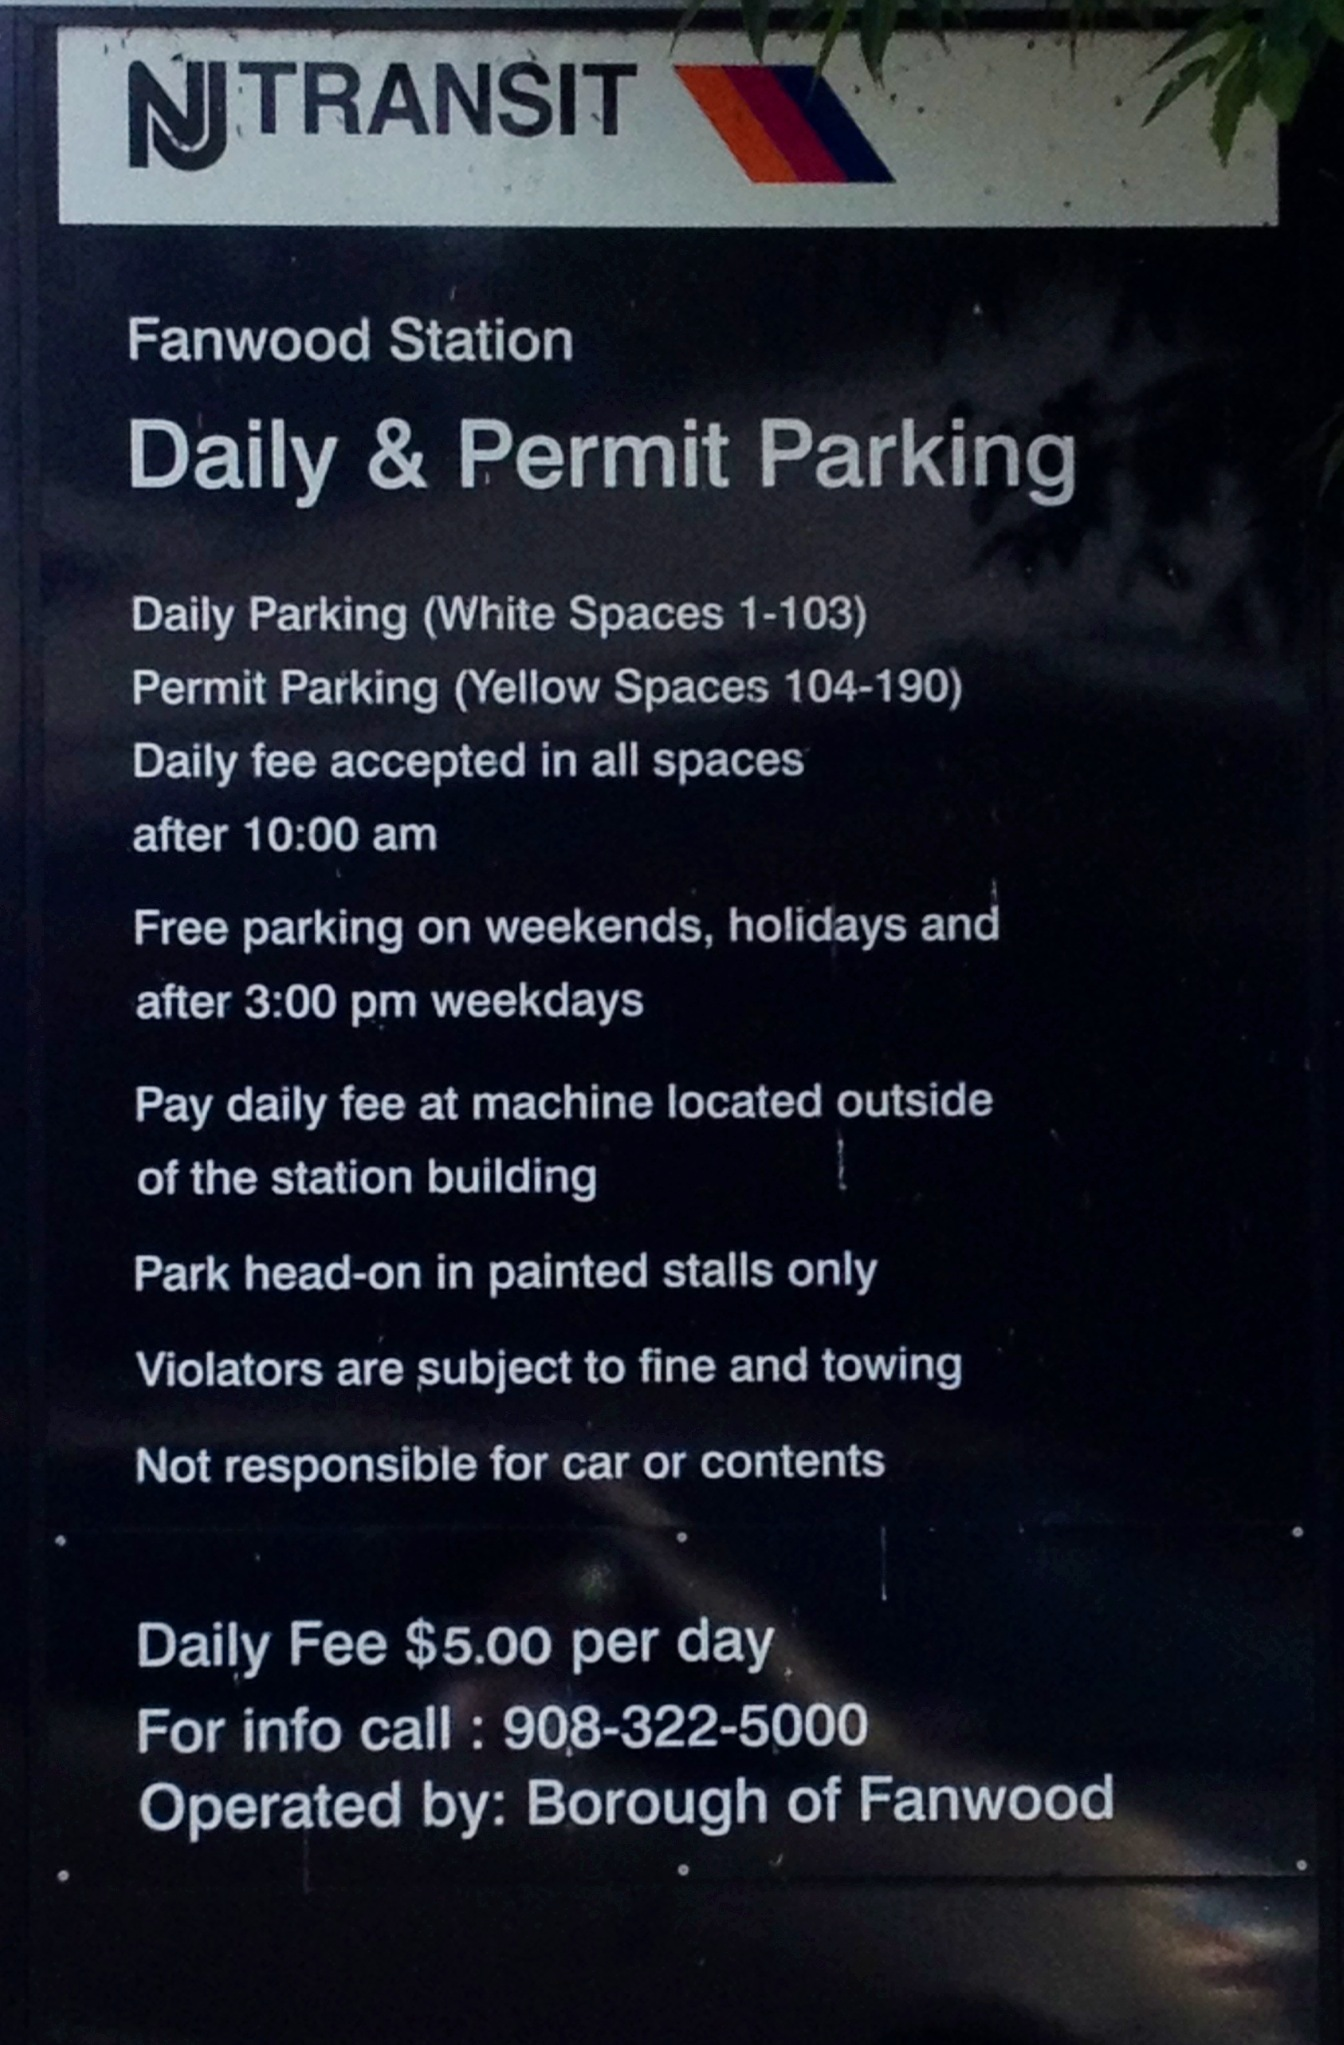 f6ba6eb6177649d5ad01_NJT_lot_Parking_Sign_-_big.jpg